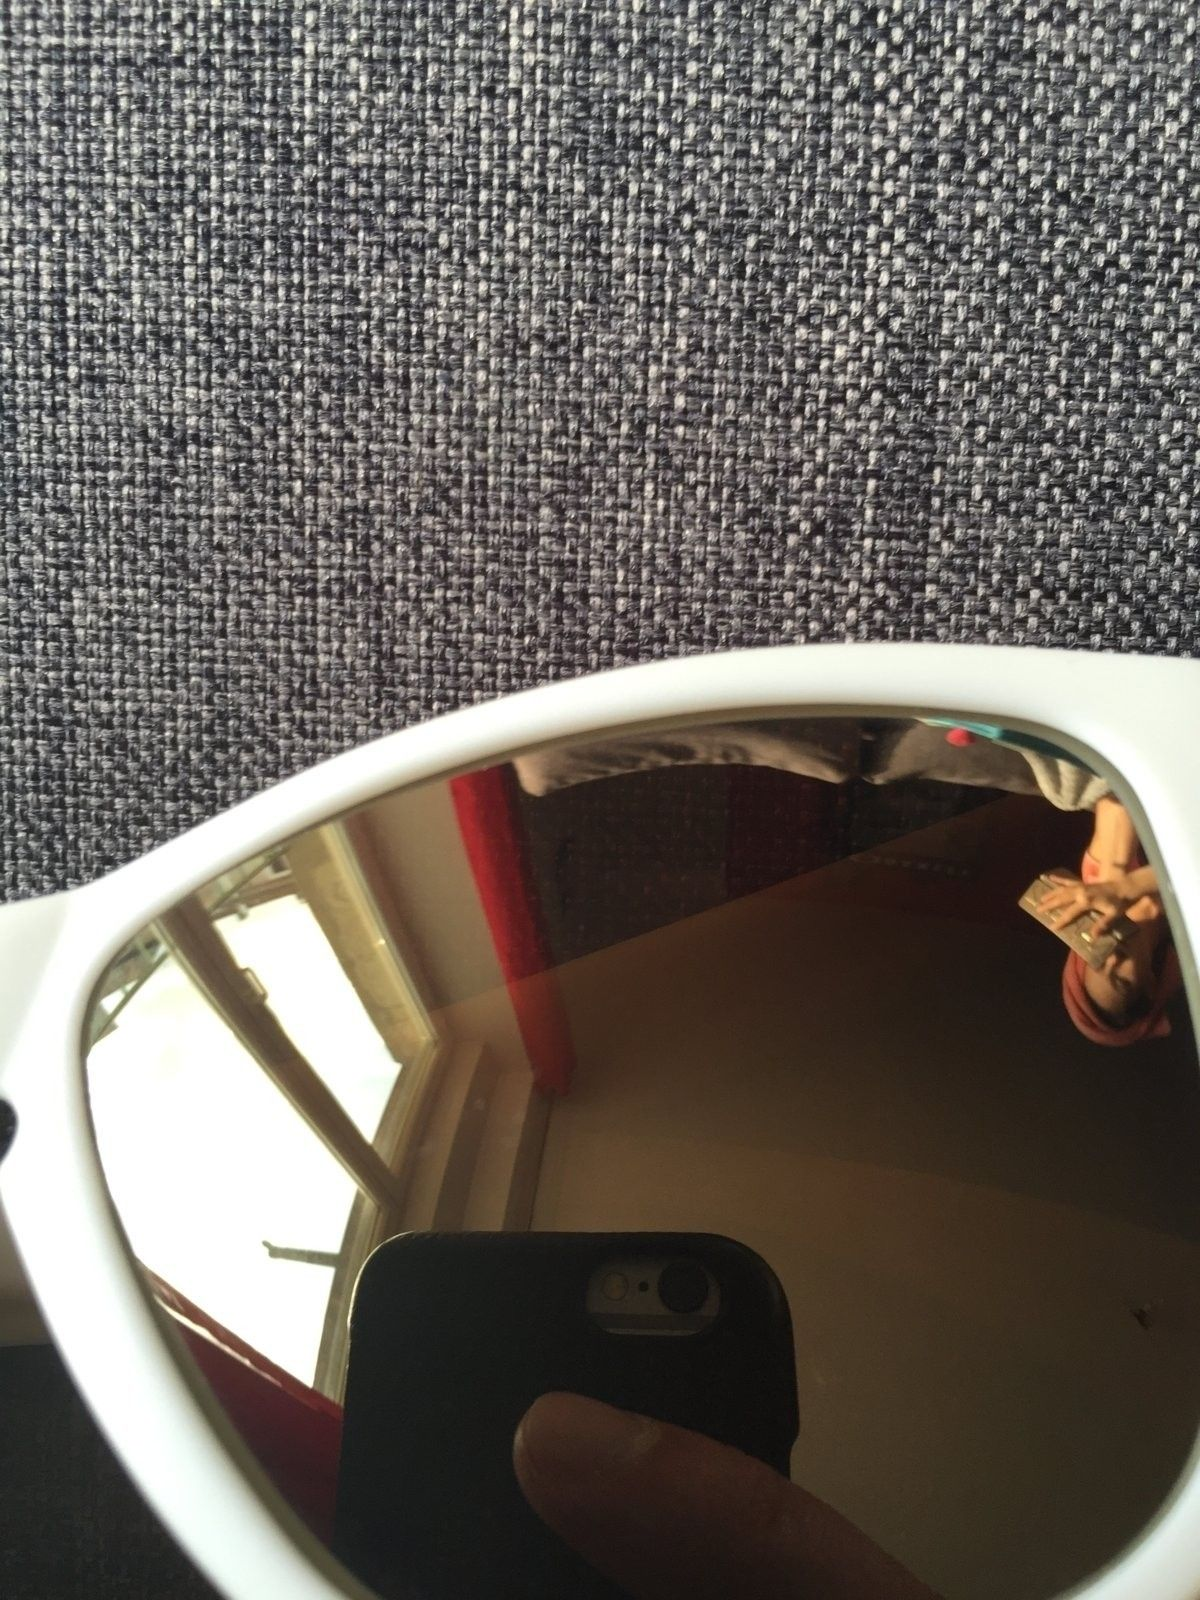 3 Frogskins first gen NOS - imadsfge.jpeg